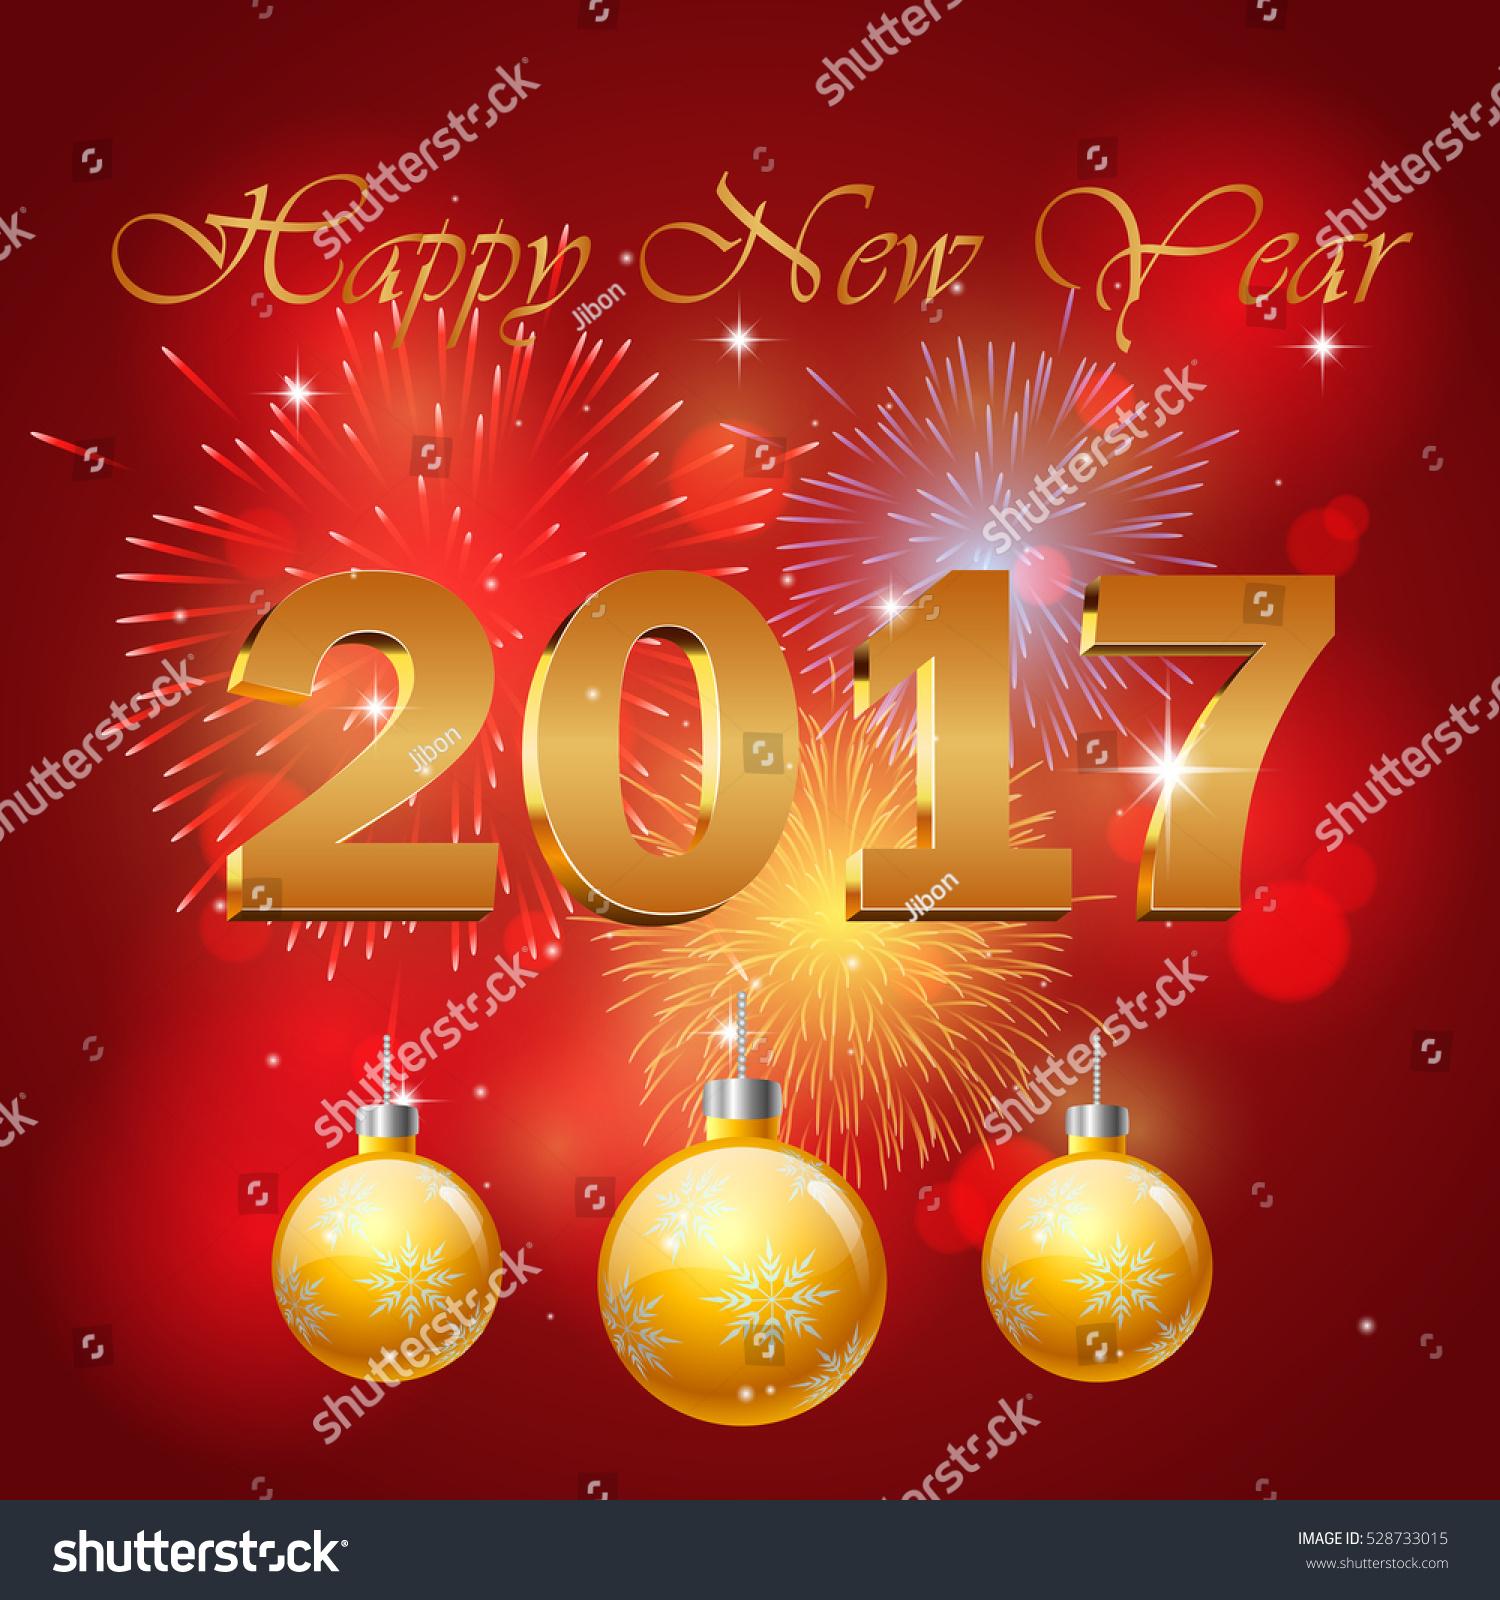 happy new year 2017 background your のベクター画像素材